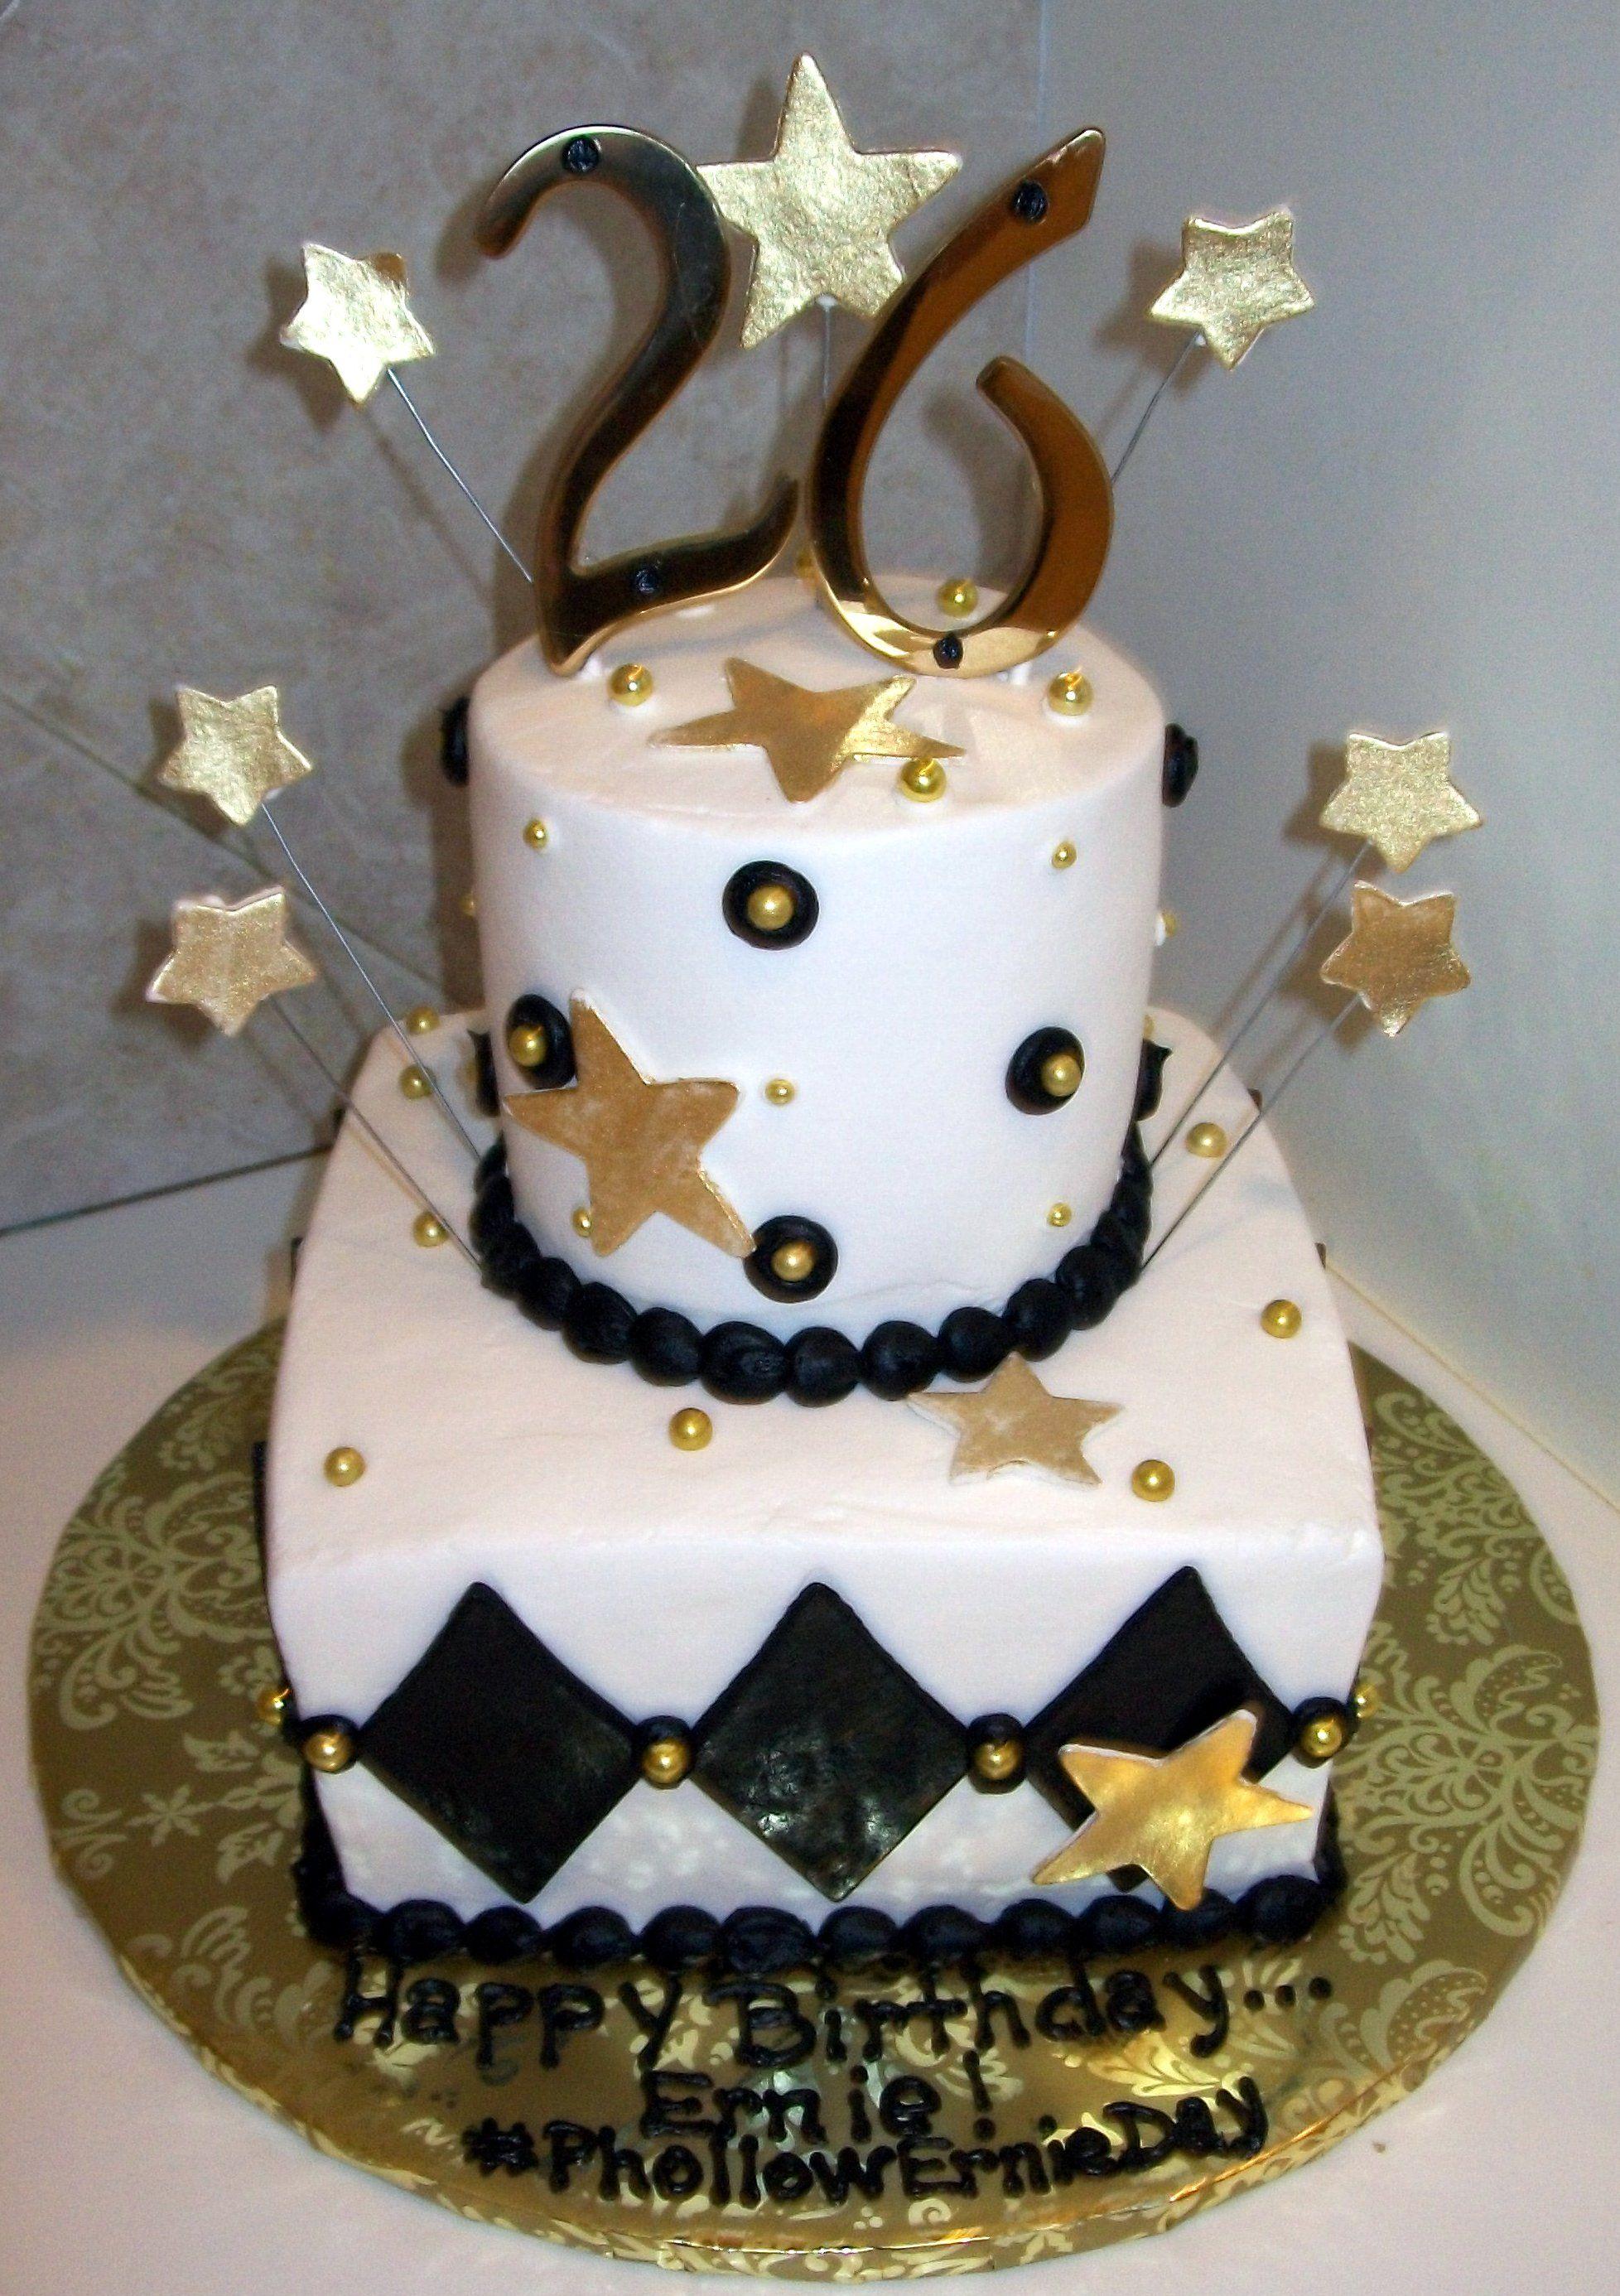 26th Birthday Cake Design Birthday Cake Designs Pinterest